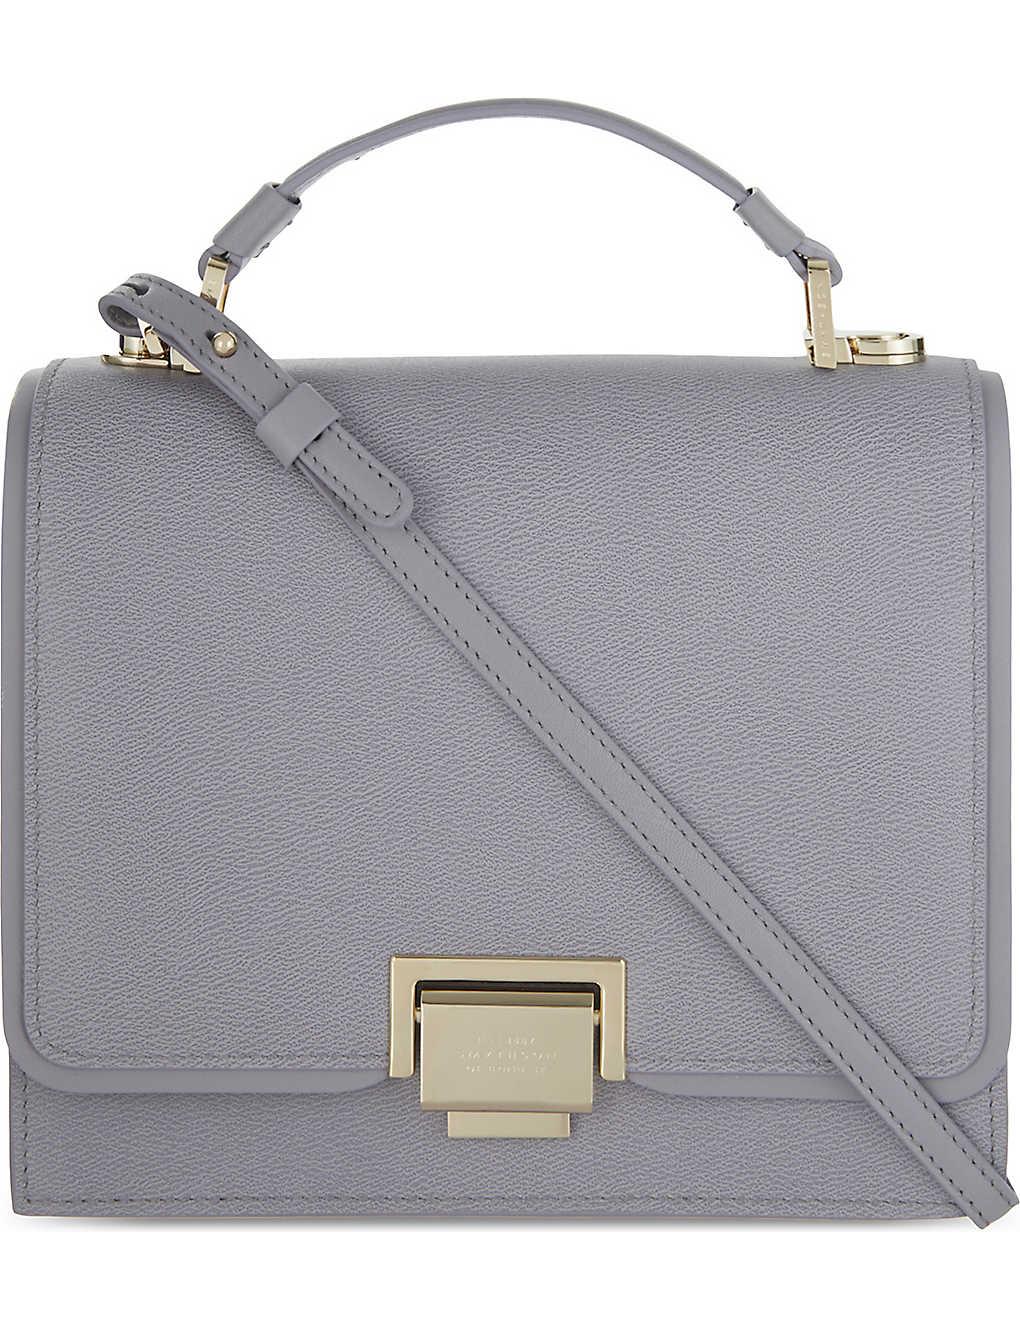 SMYTHSON - Grosvenor mini leather cross-body bag  466a52ea6e355